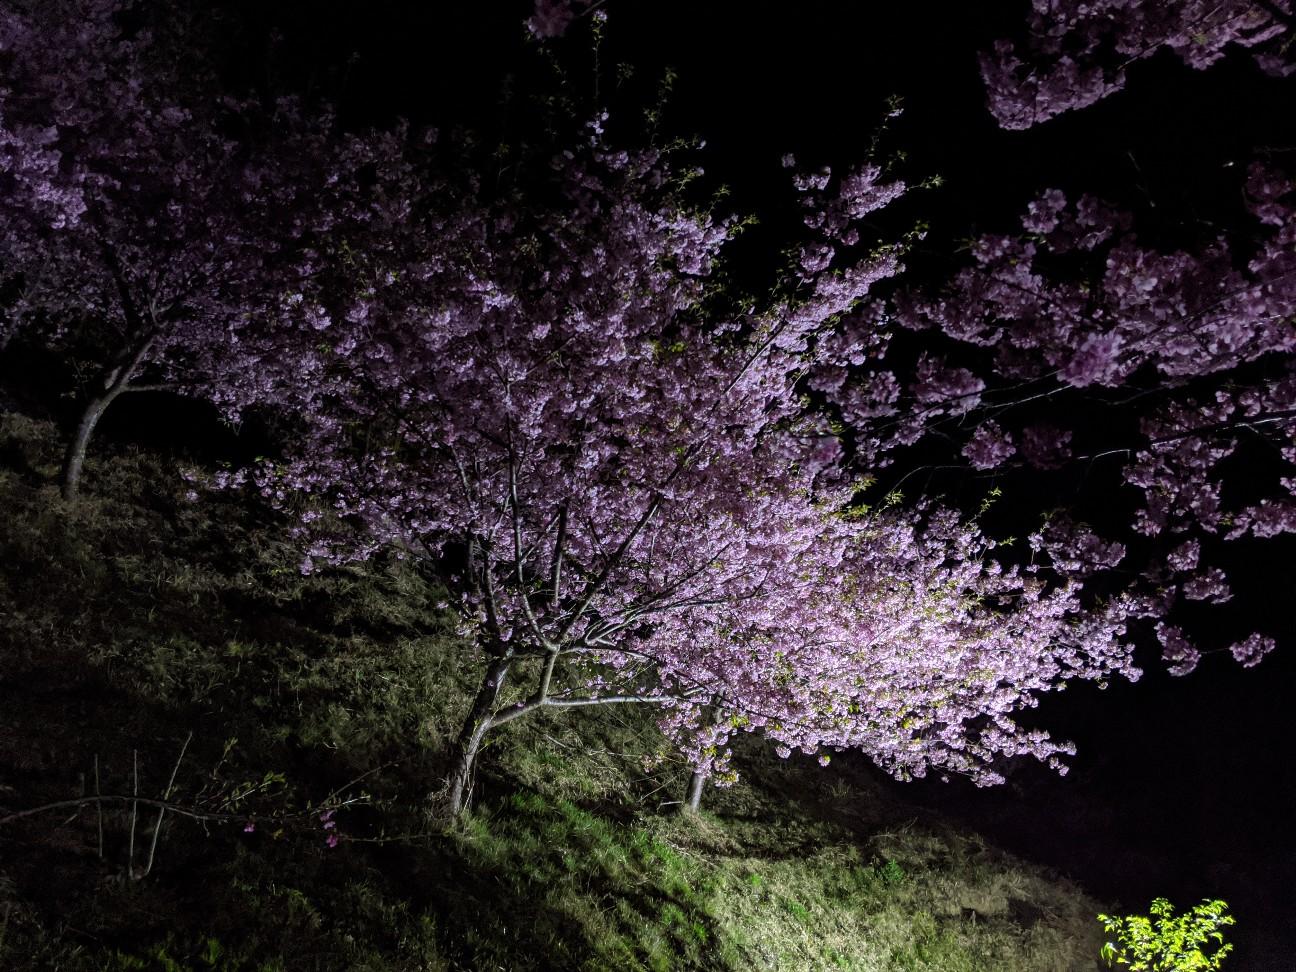 f:id:moriken-isumi:20200223203552j:image